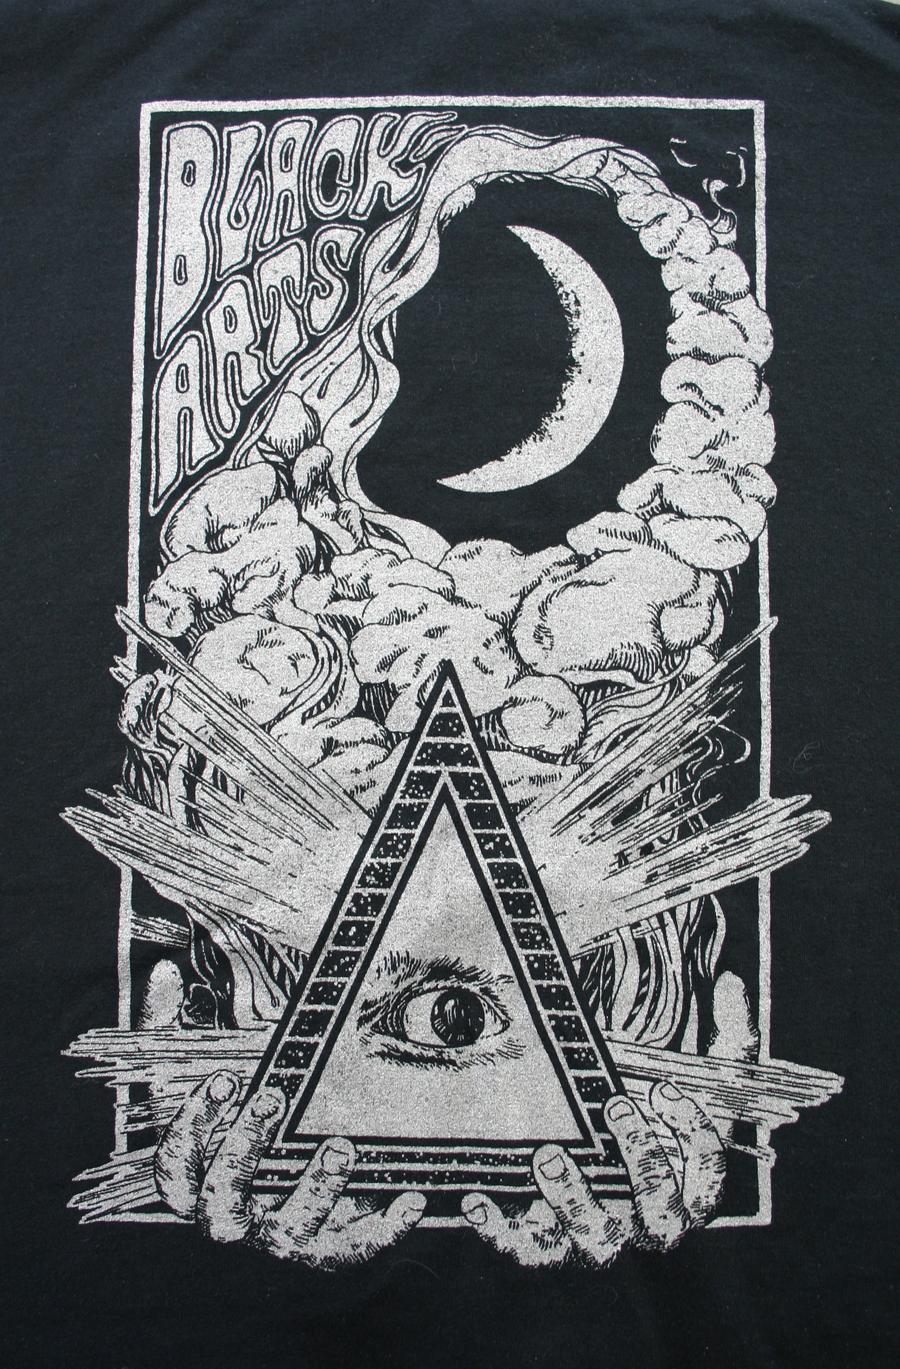 studio-on-fire-tee-shirt-black-arts.jpg